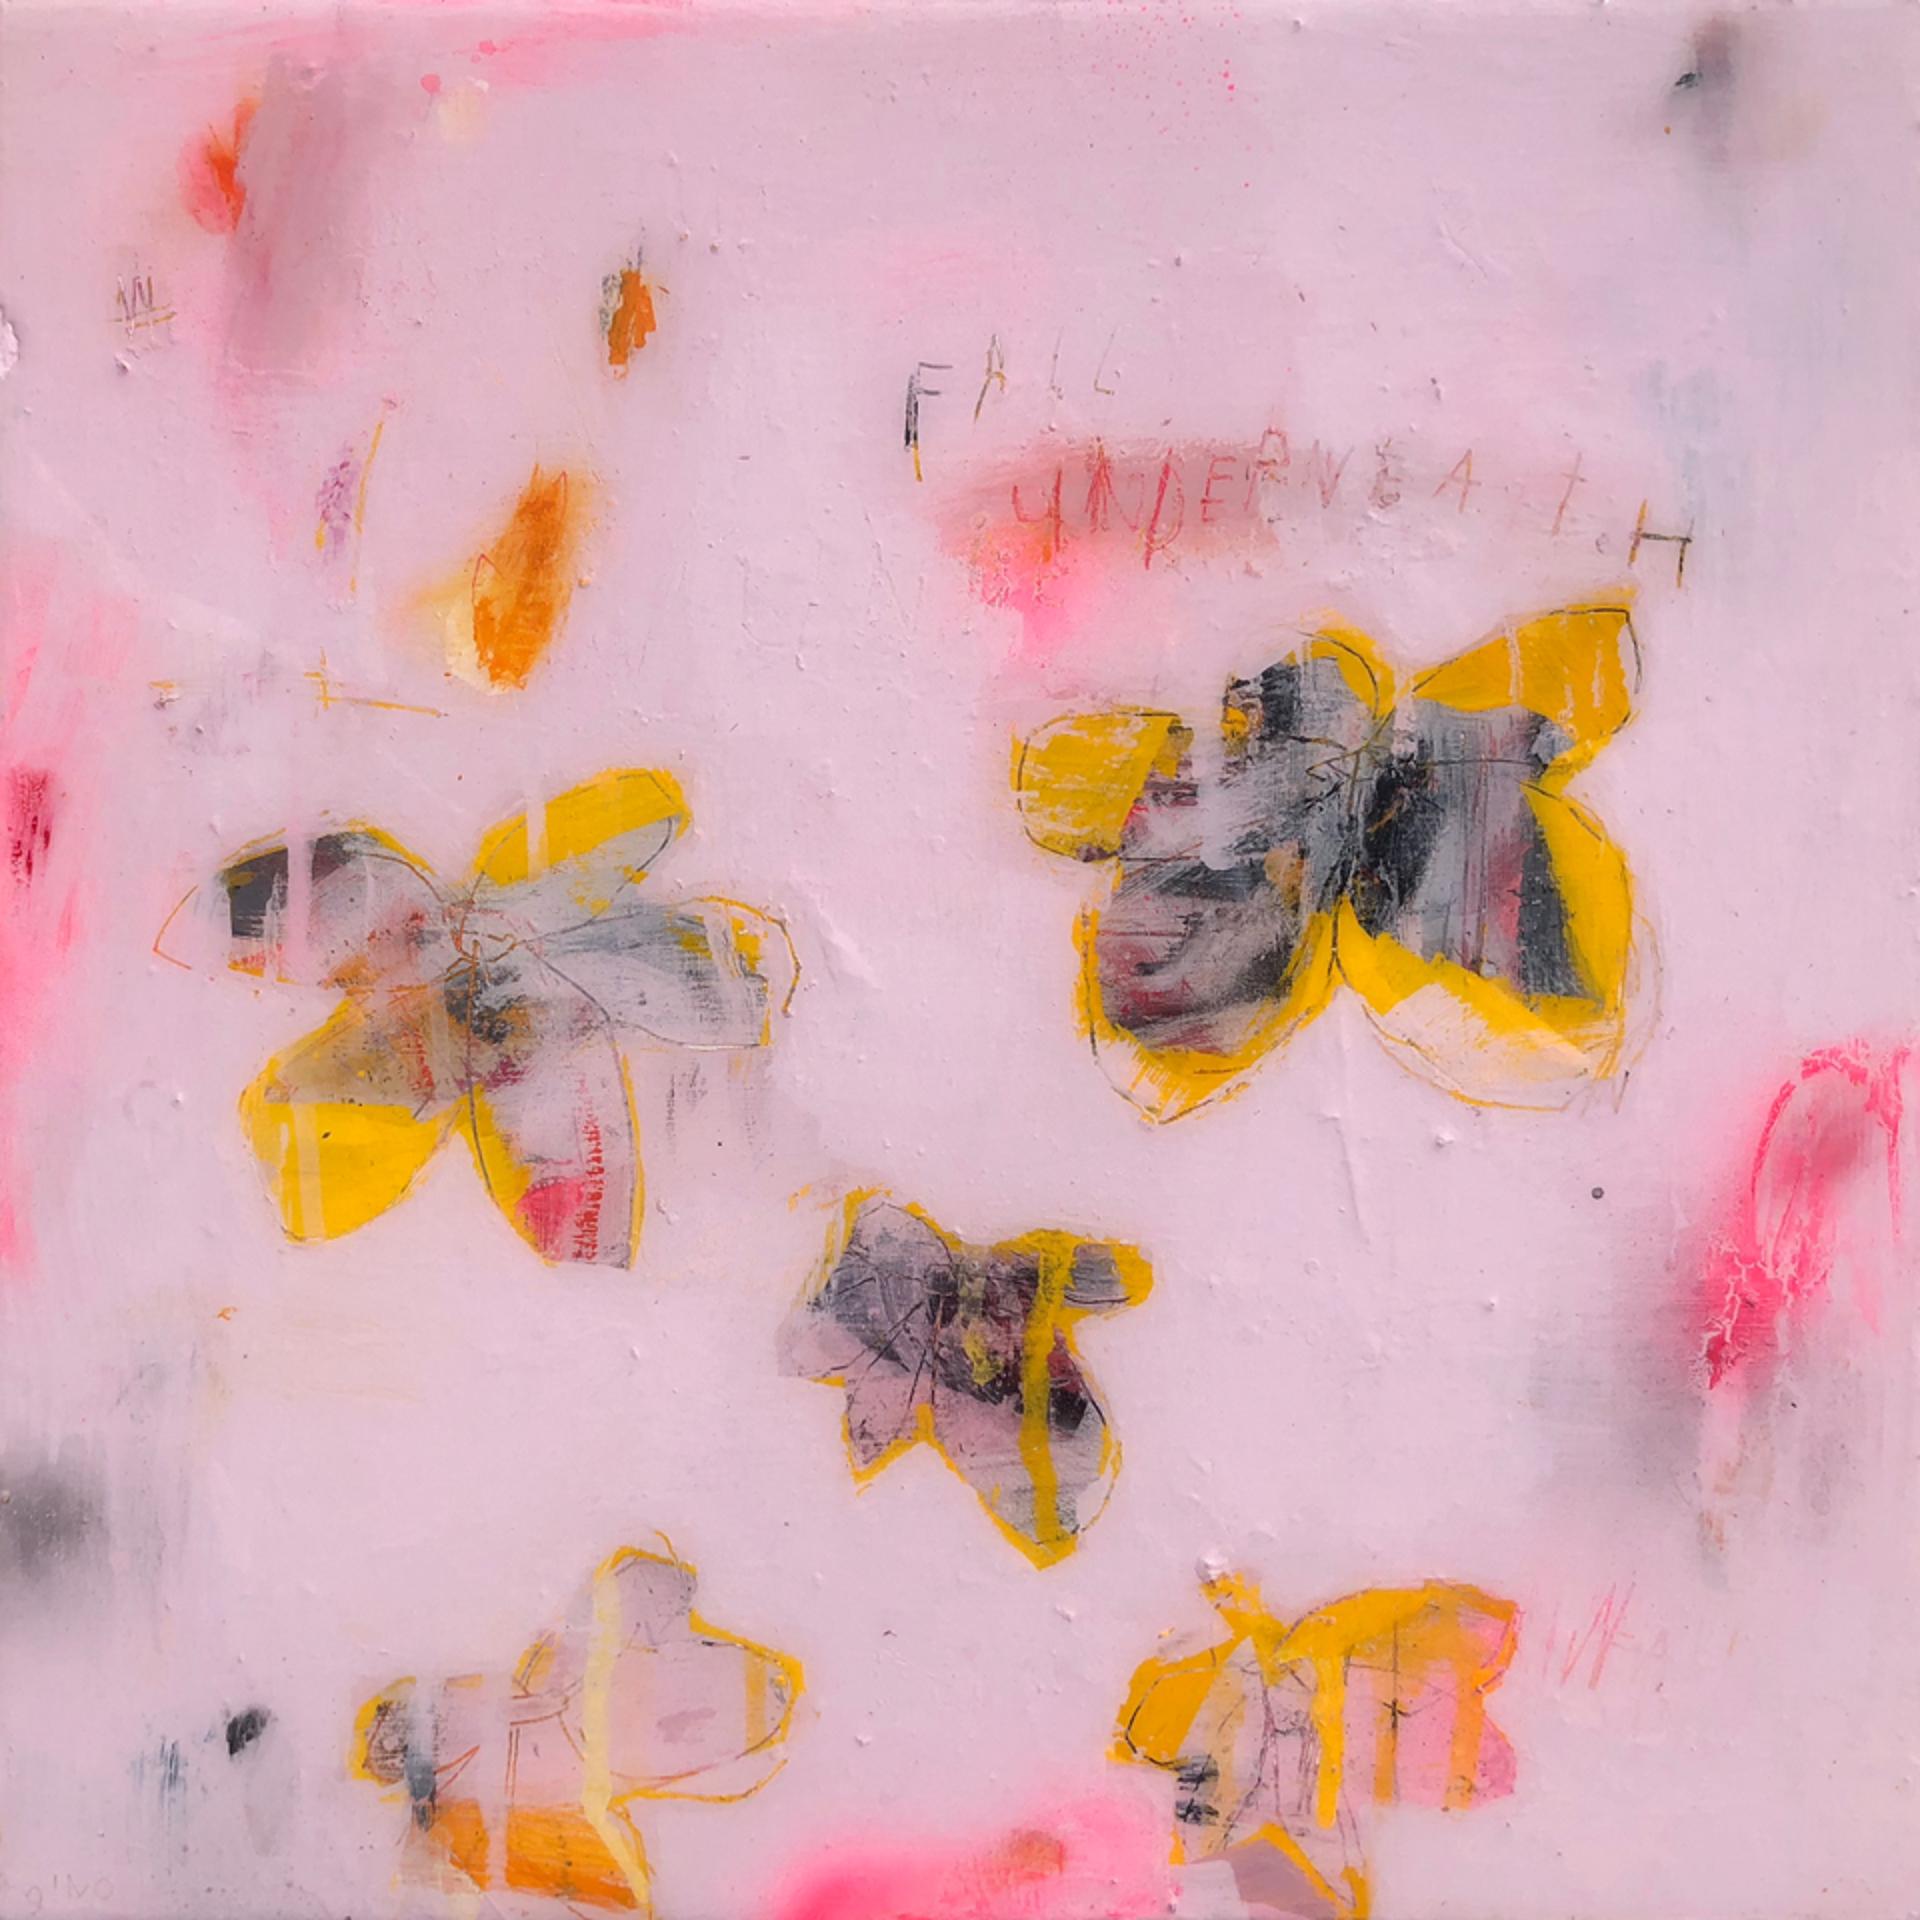 Fall Underneath by Gino Belassen